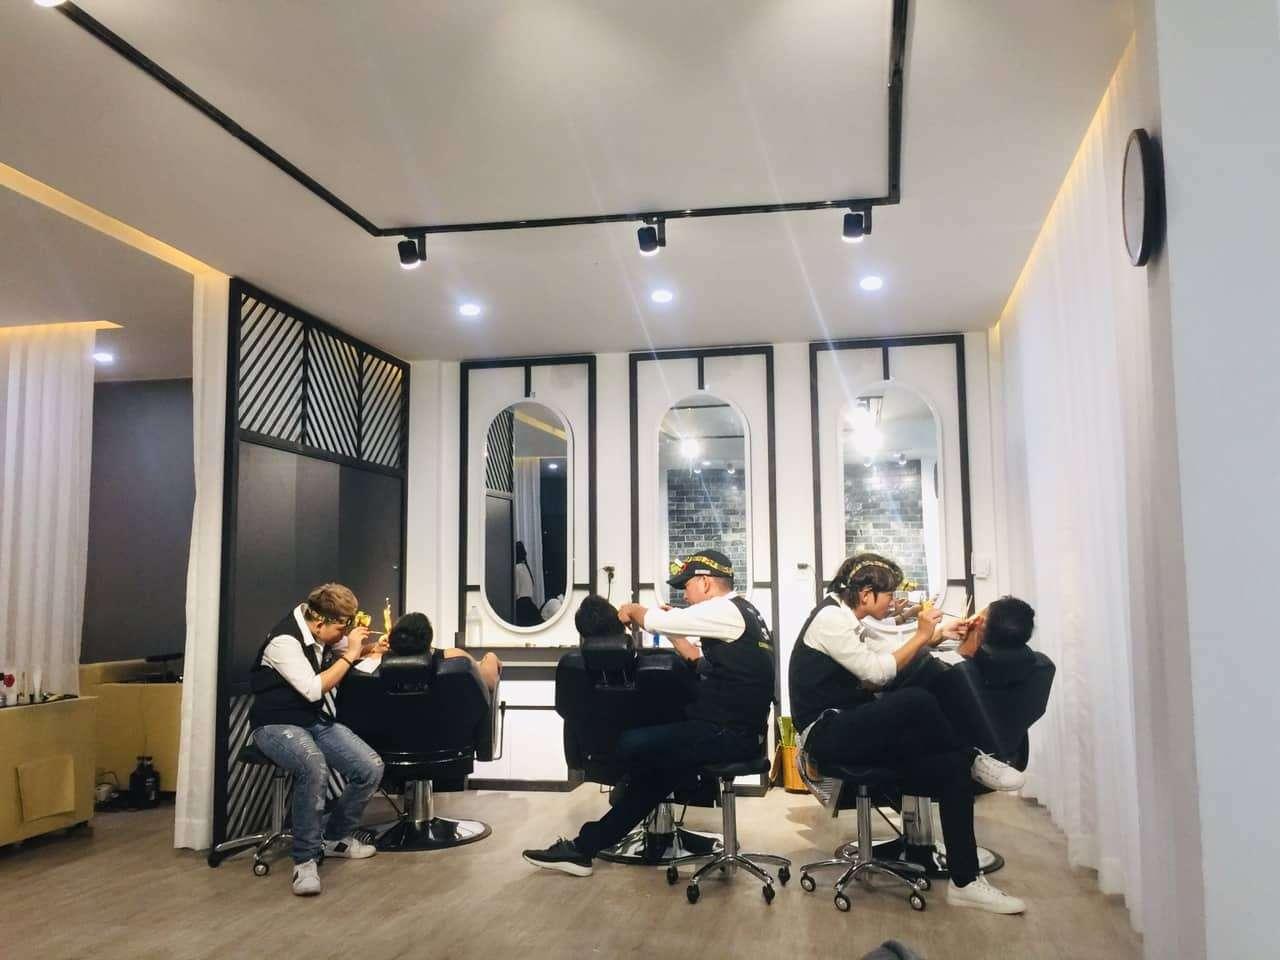 3 Man Hair Salon